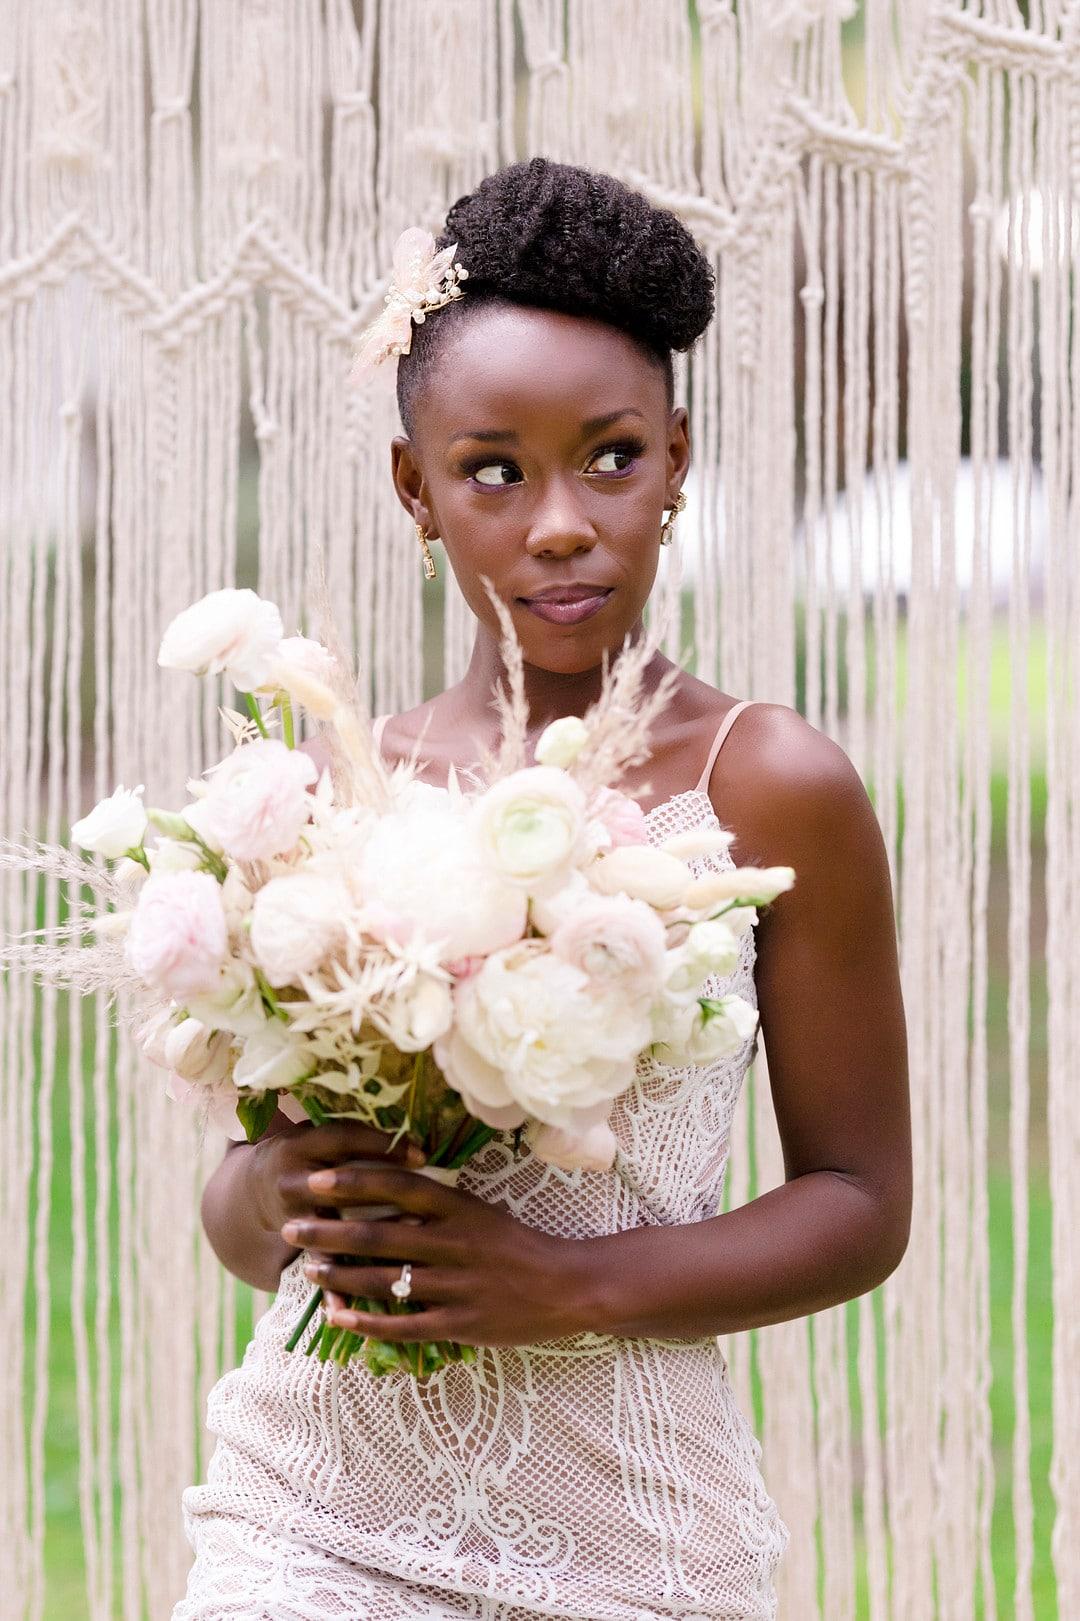 Elegant Boho Wedding Picnic_Susan Dixon Photography, LLC_susan-dixon-016_low